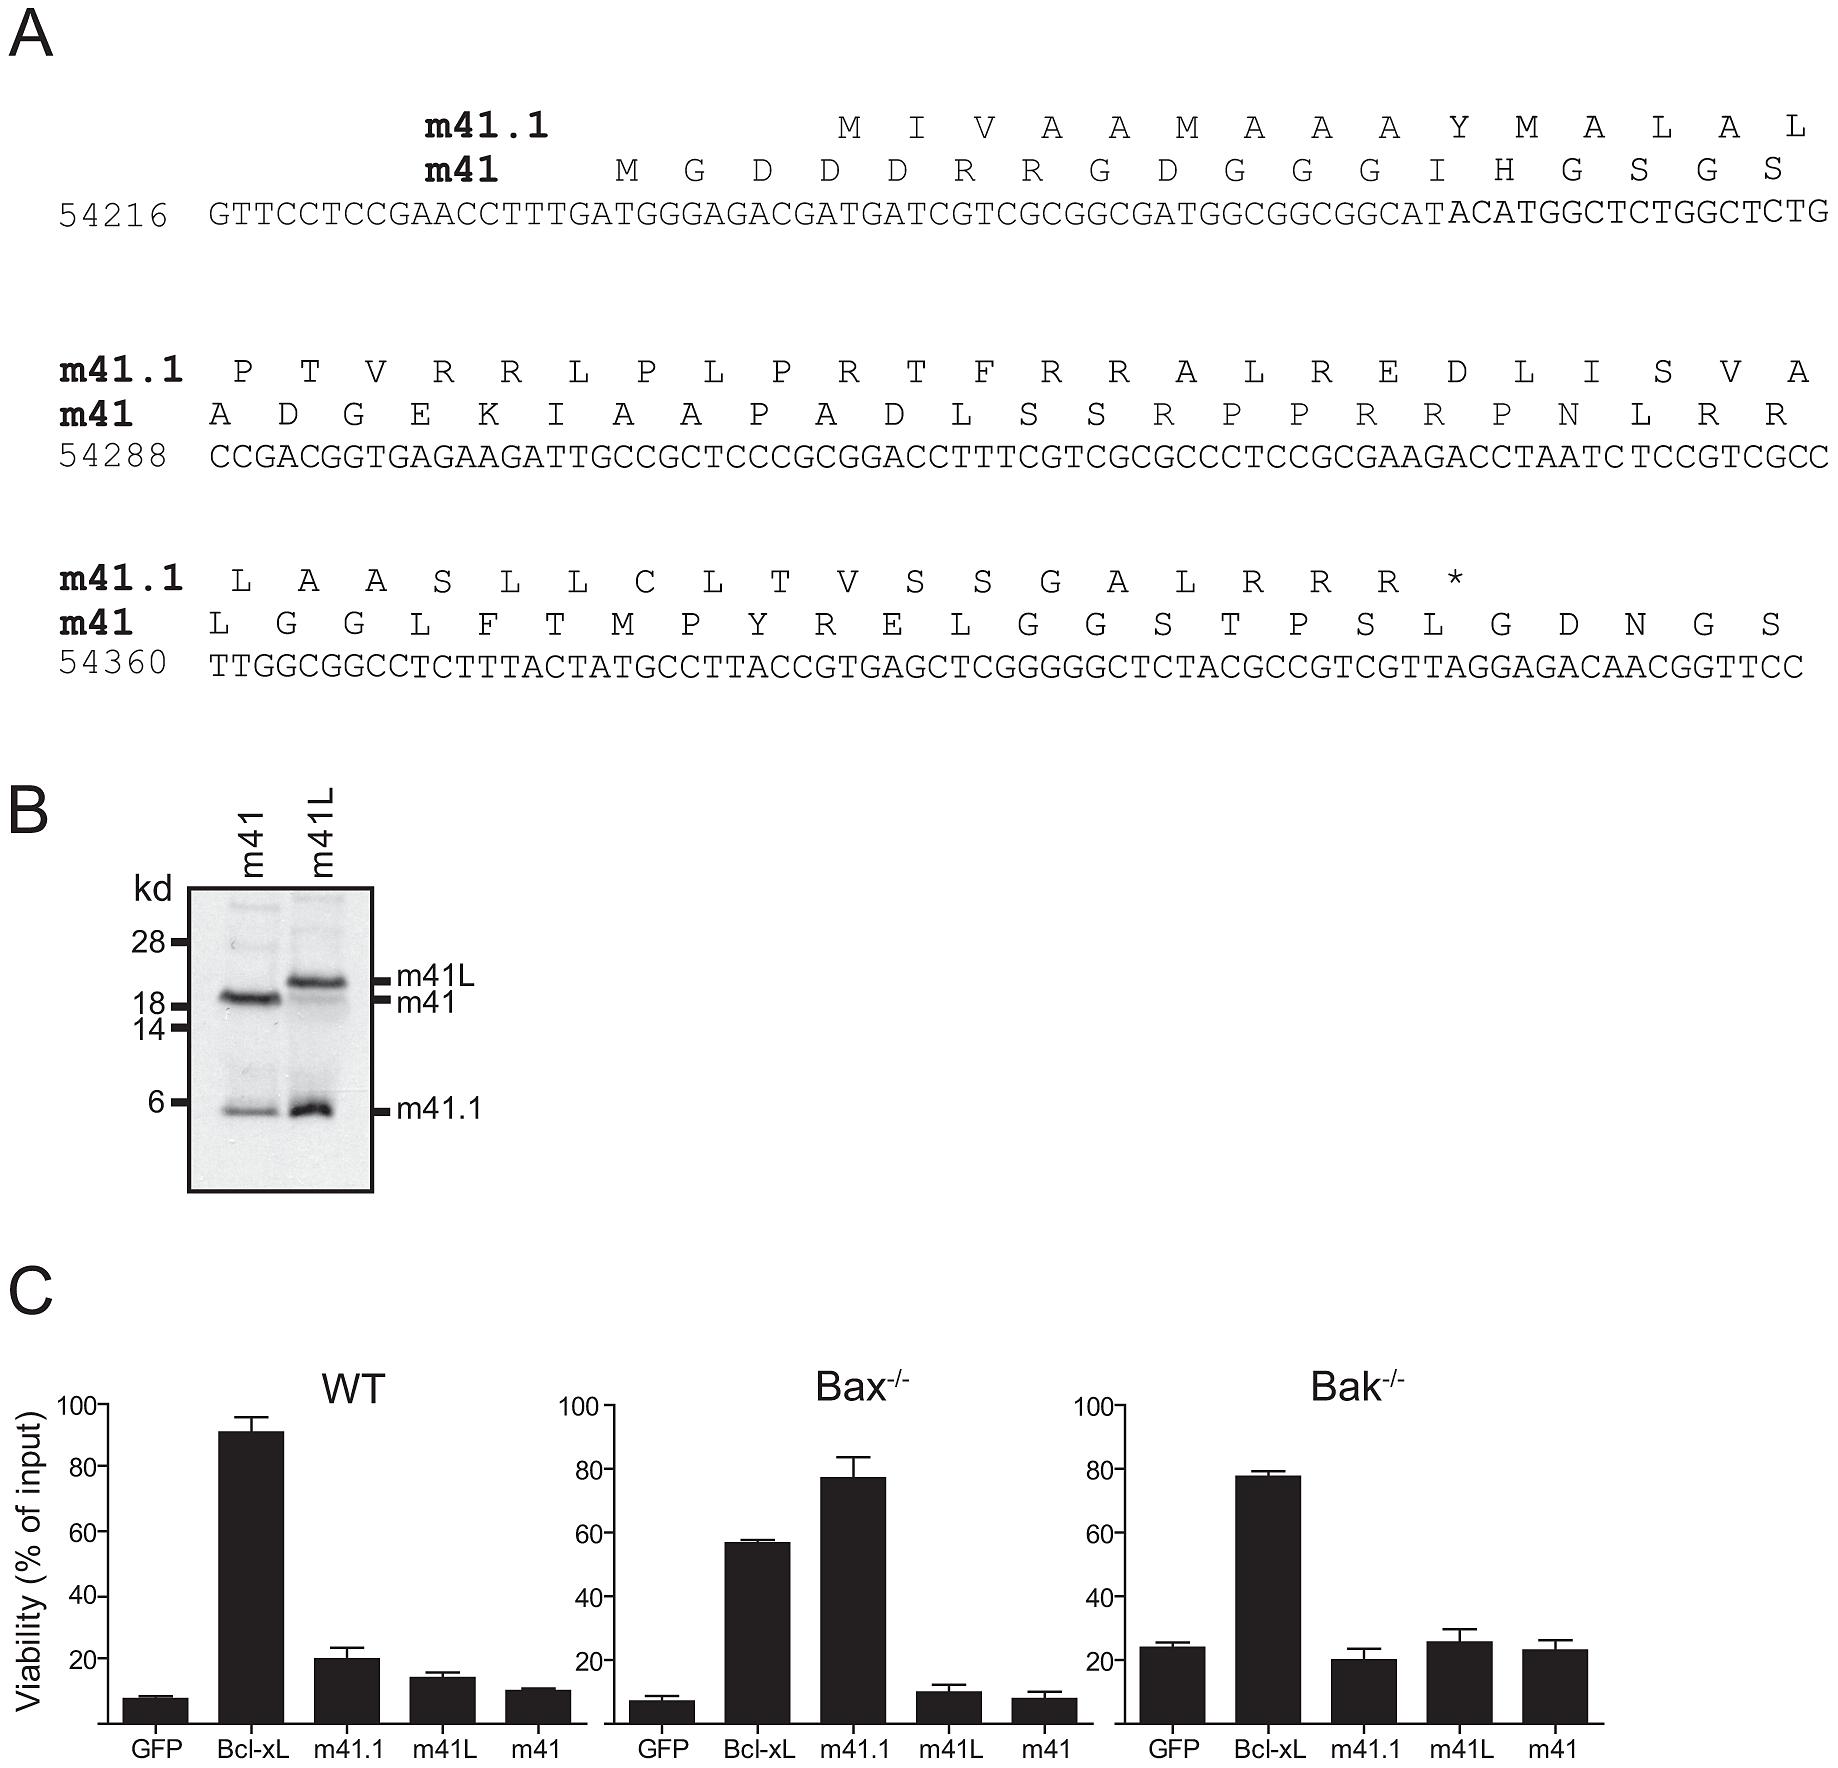 m41.1 encodes a Bak-specific inhibitor.